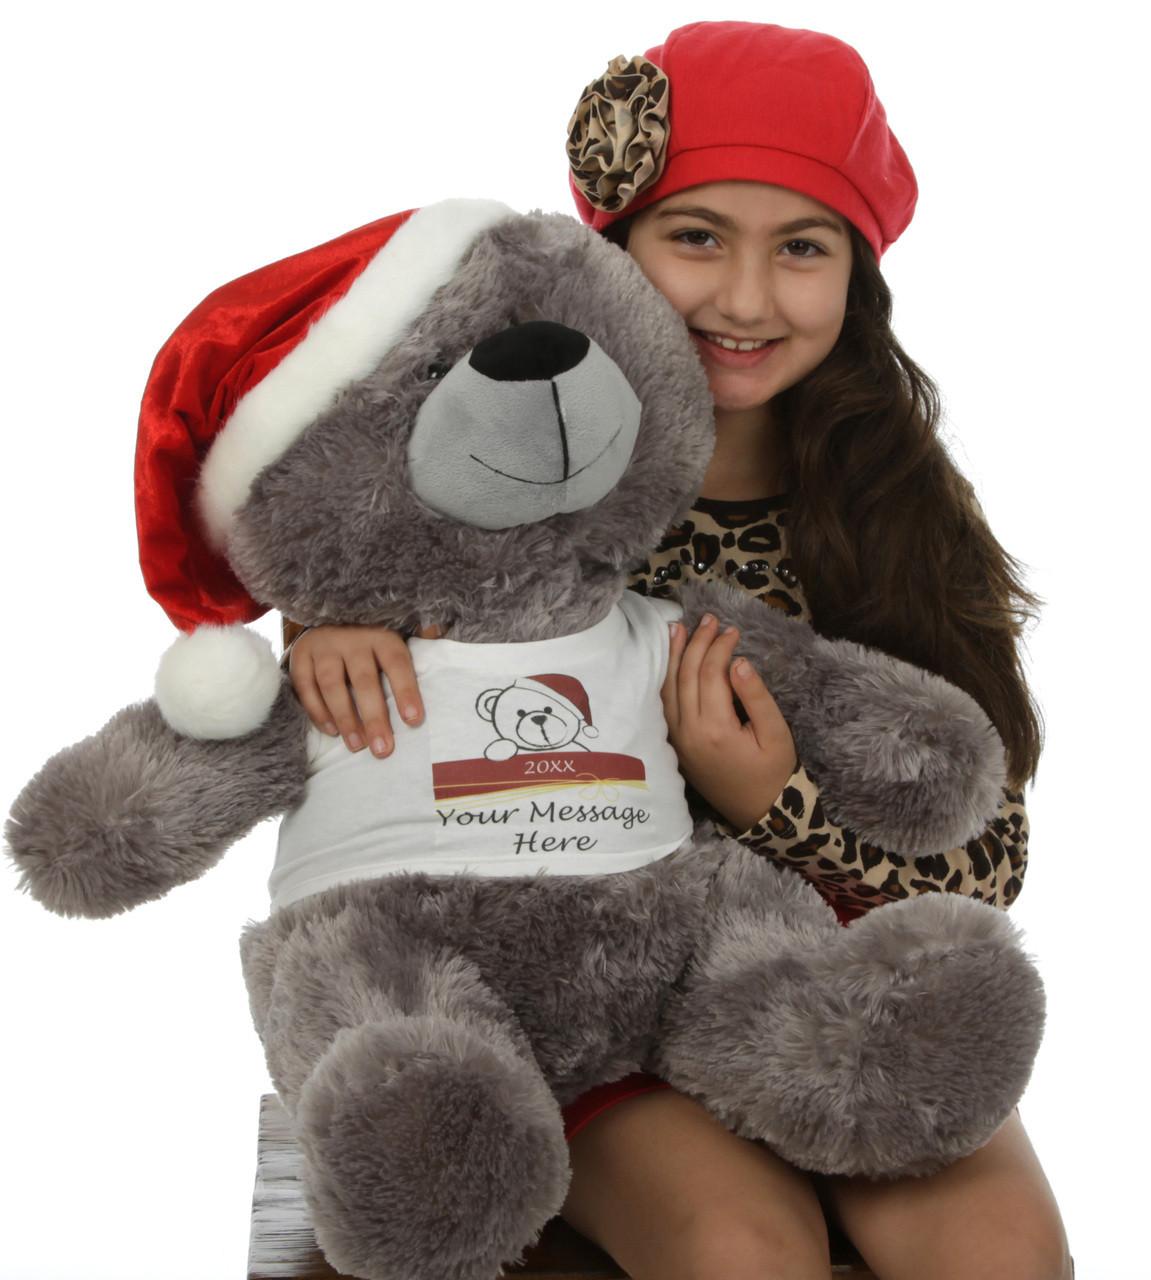 27in Diamond Shags Personalized Christmas Teddy Bear in Santa Hat